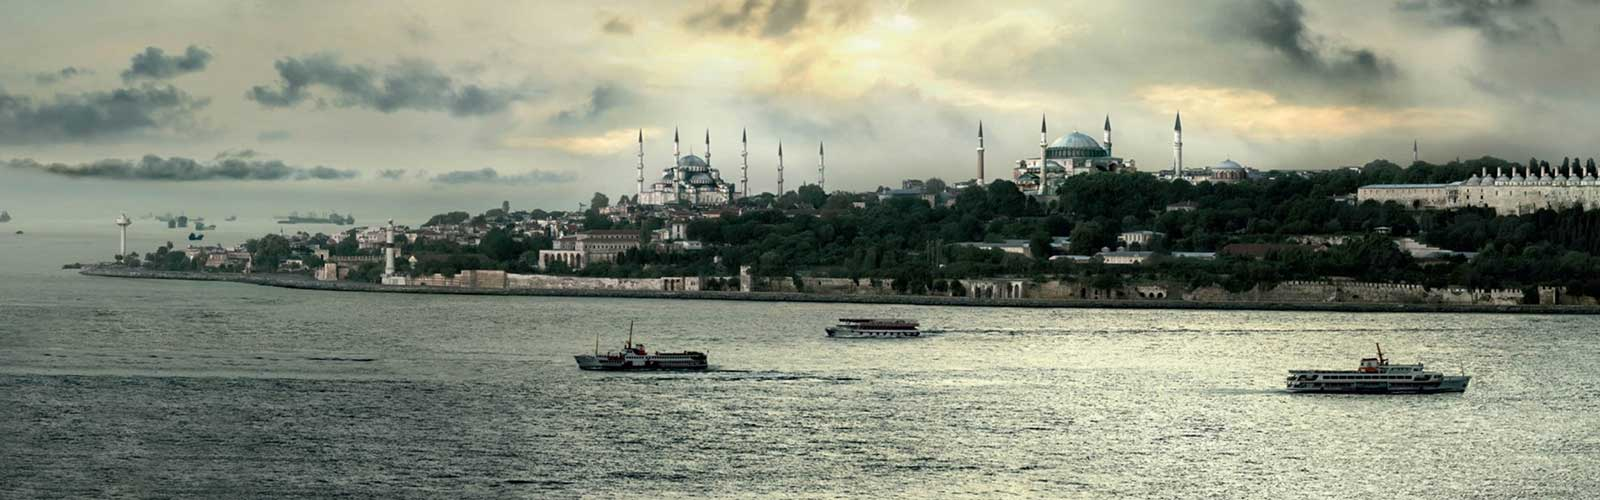 Sea of Marmara Region, Turkey